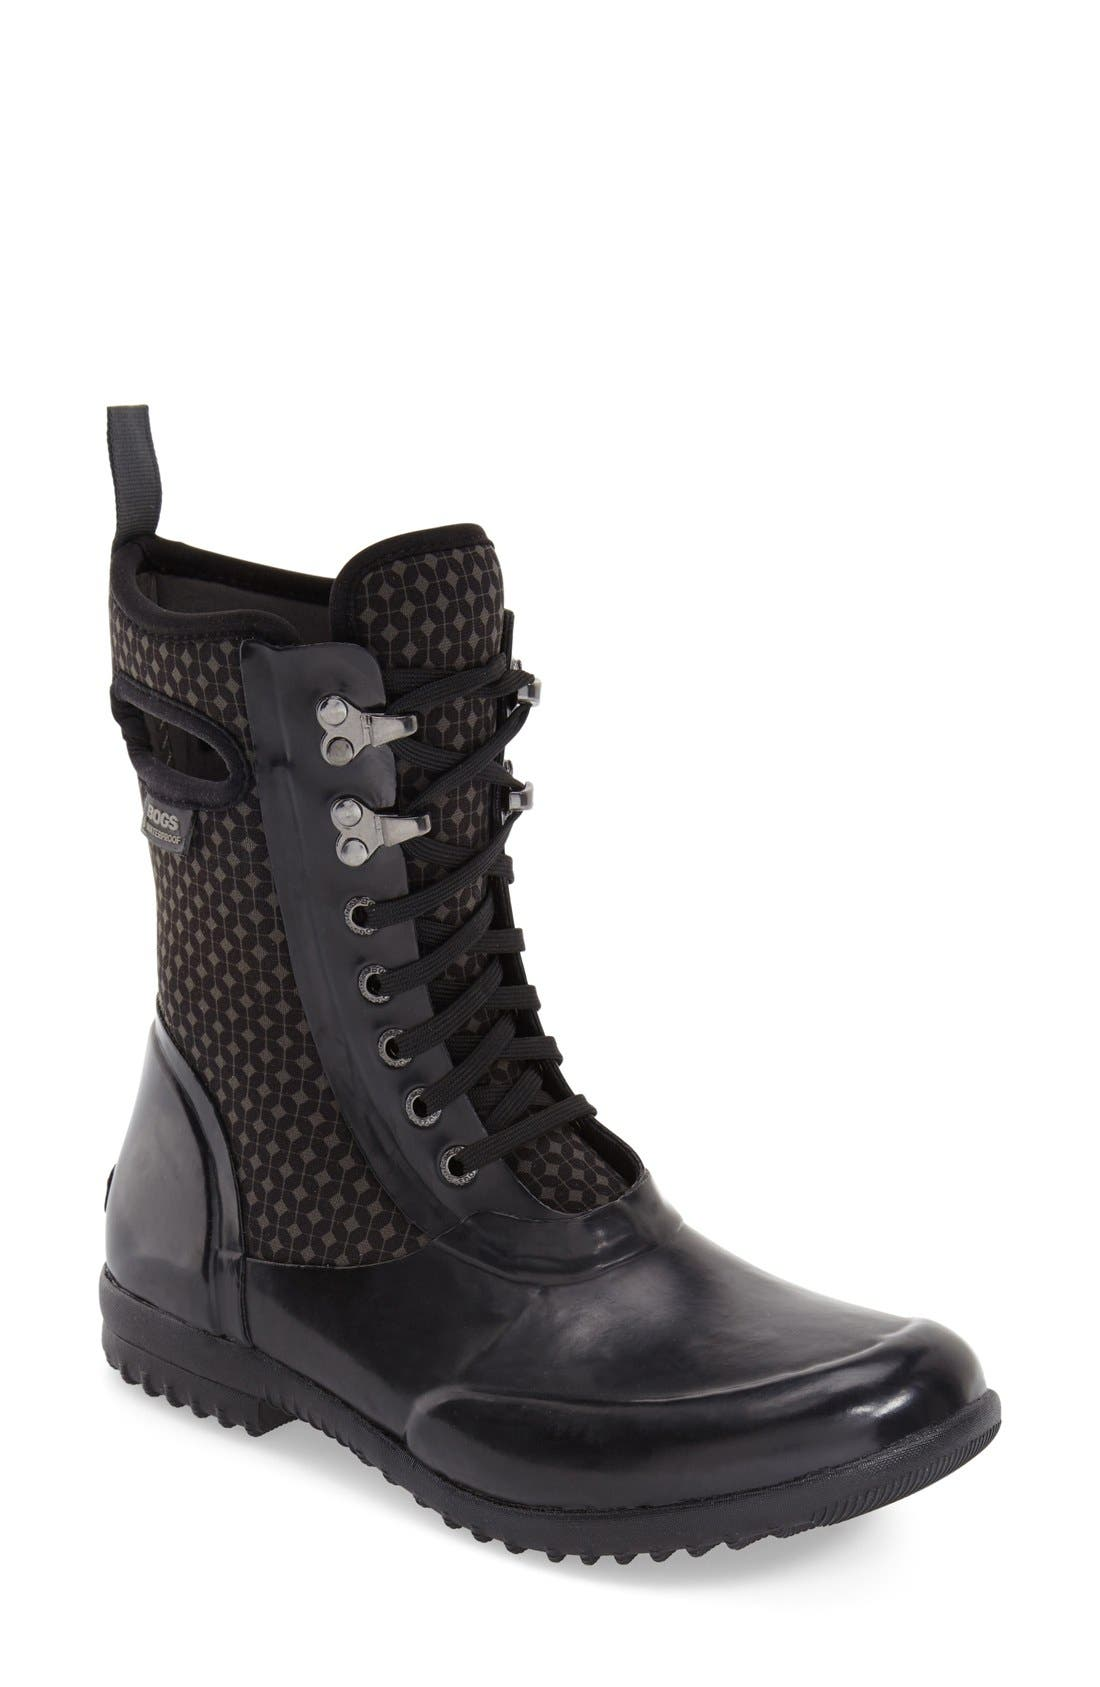 'Sidney Cravat' Lace-Up Waterproof Boot,                         Main,                         color, 009